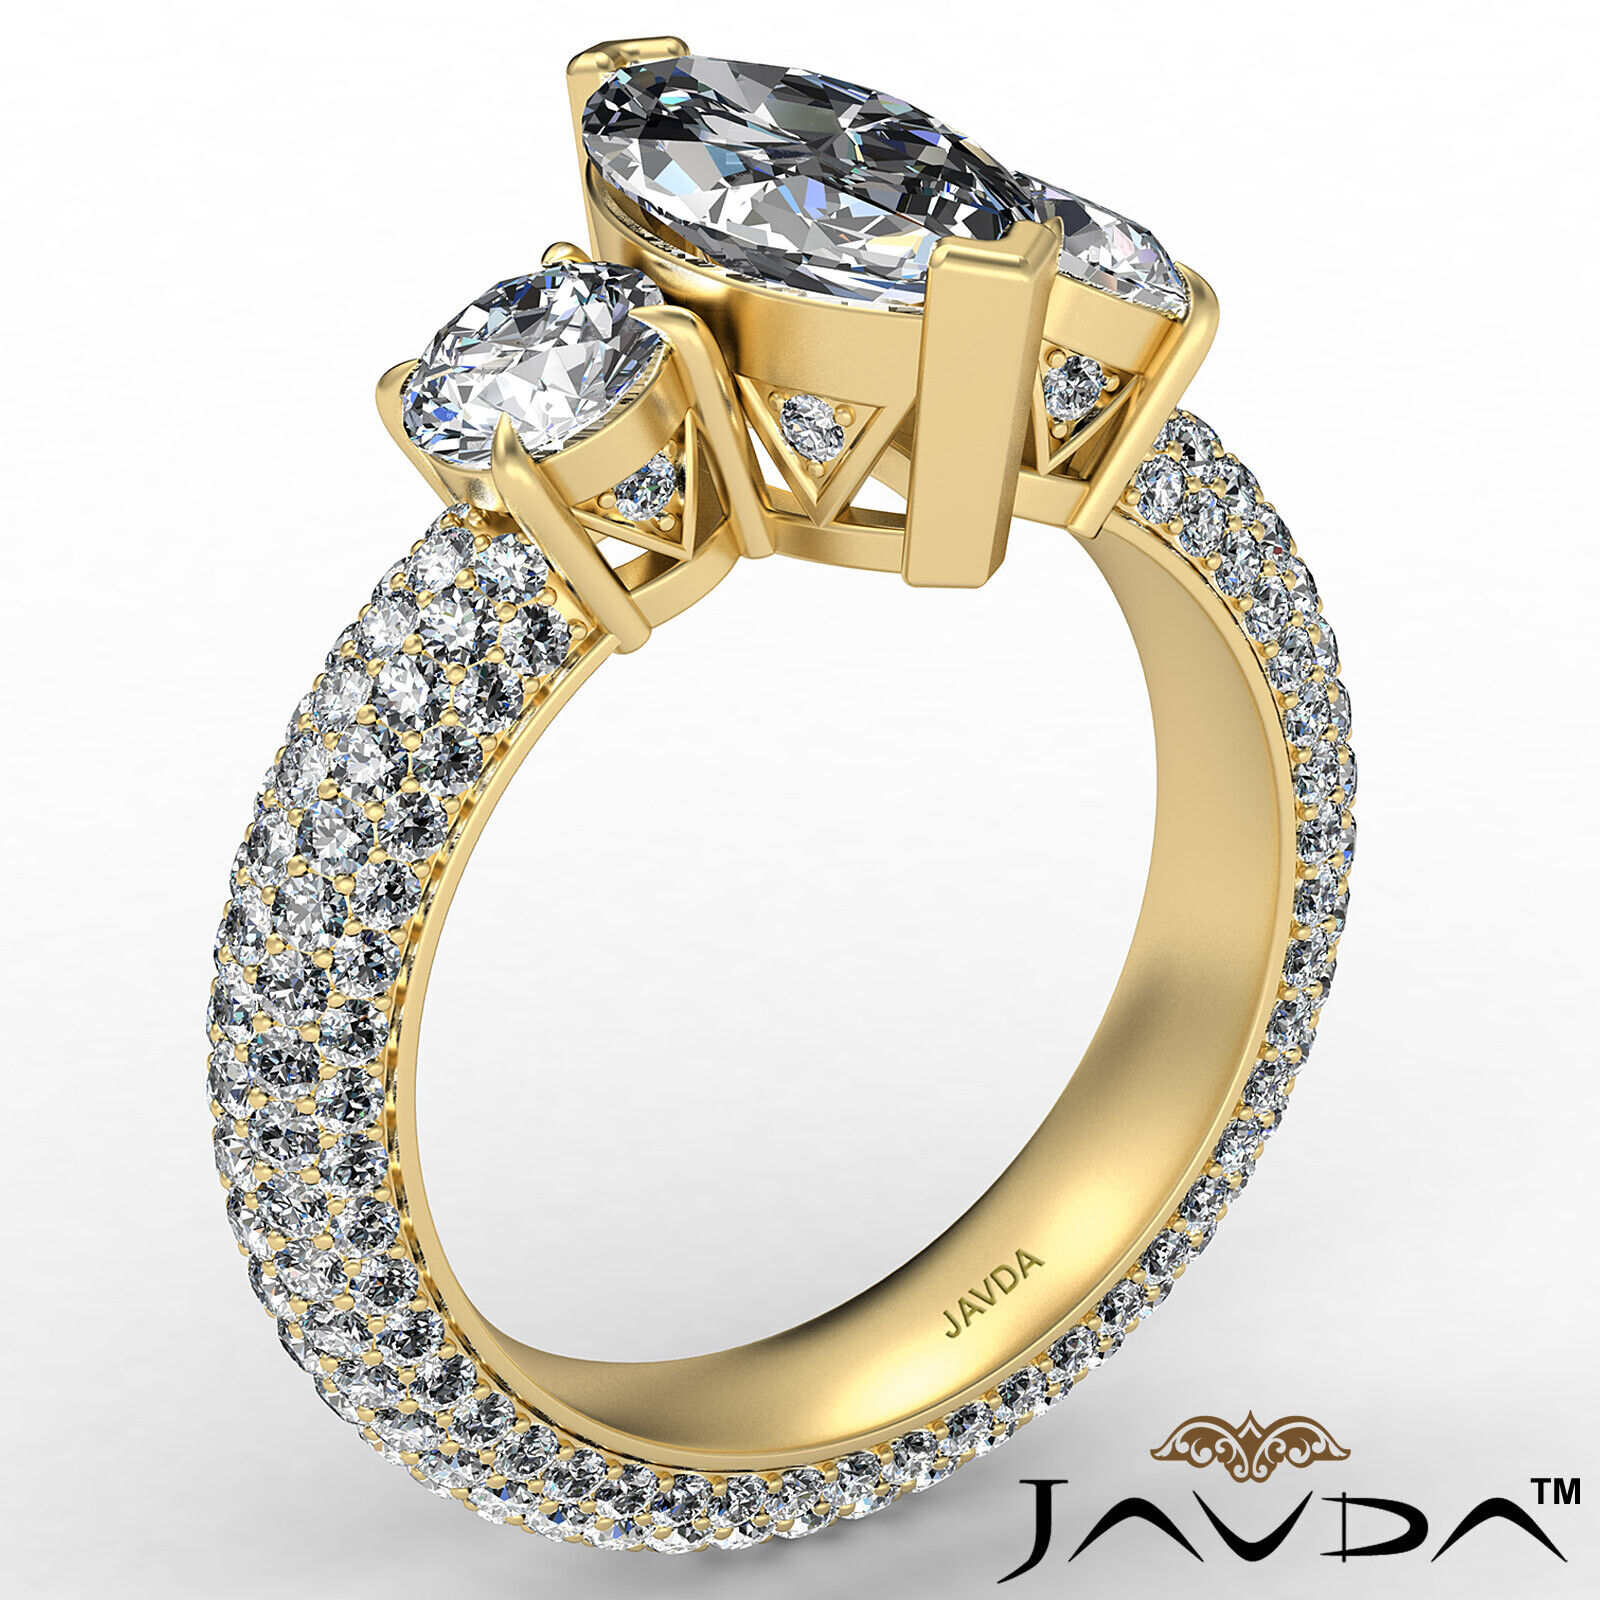 Marquise Diamond Engagement Pave Set Ring GIA K Color & VVS2 clarity 3.05 ctw 4